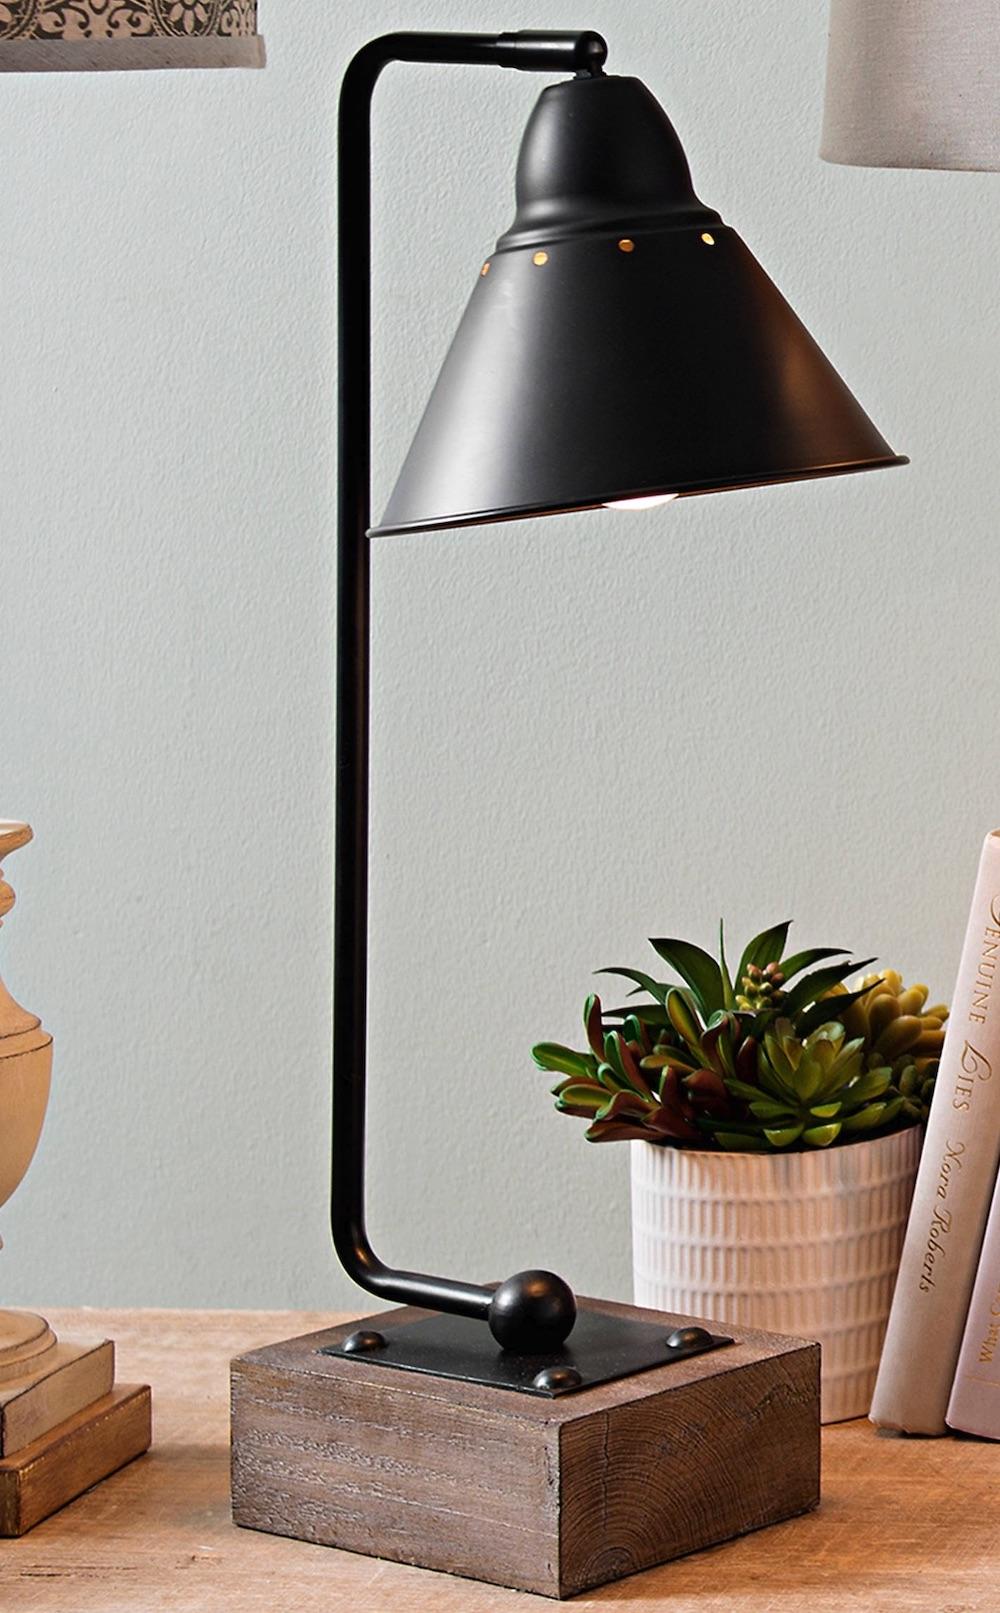 Industrial Desk Lamps for your Workspace Louis Matte Black Metal and Wood Table Lamp #DeskLamps #OfficeLamps #HomeOffice #HomeOfficeDeskLamp #Decor #FarmhouseDecor #IndustrialDecor #WorkingMoms #WorkFromHome